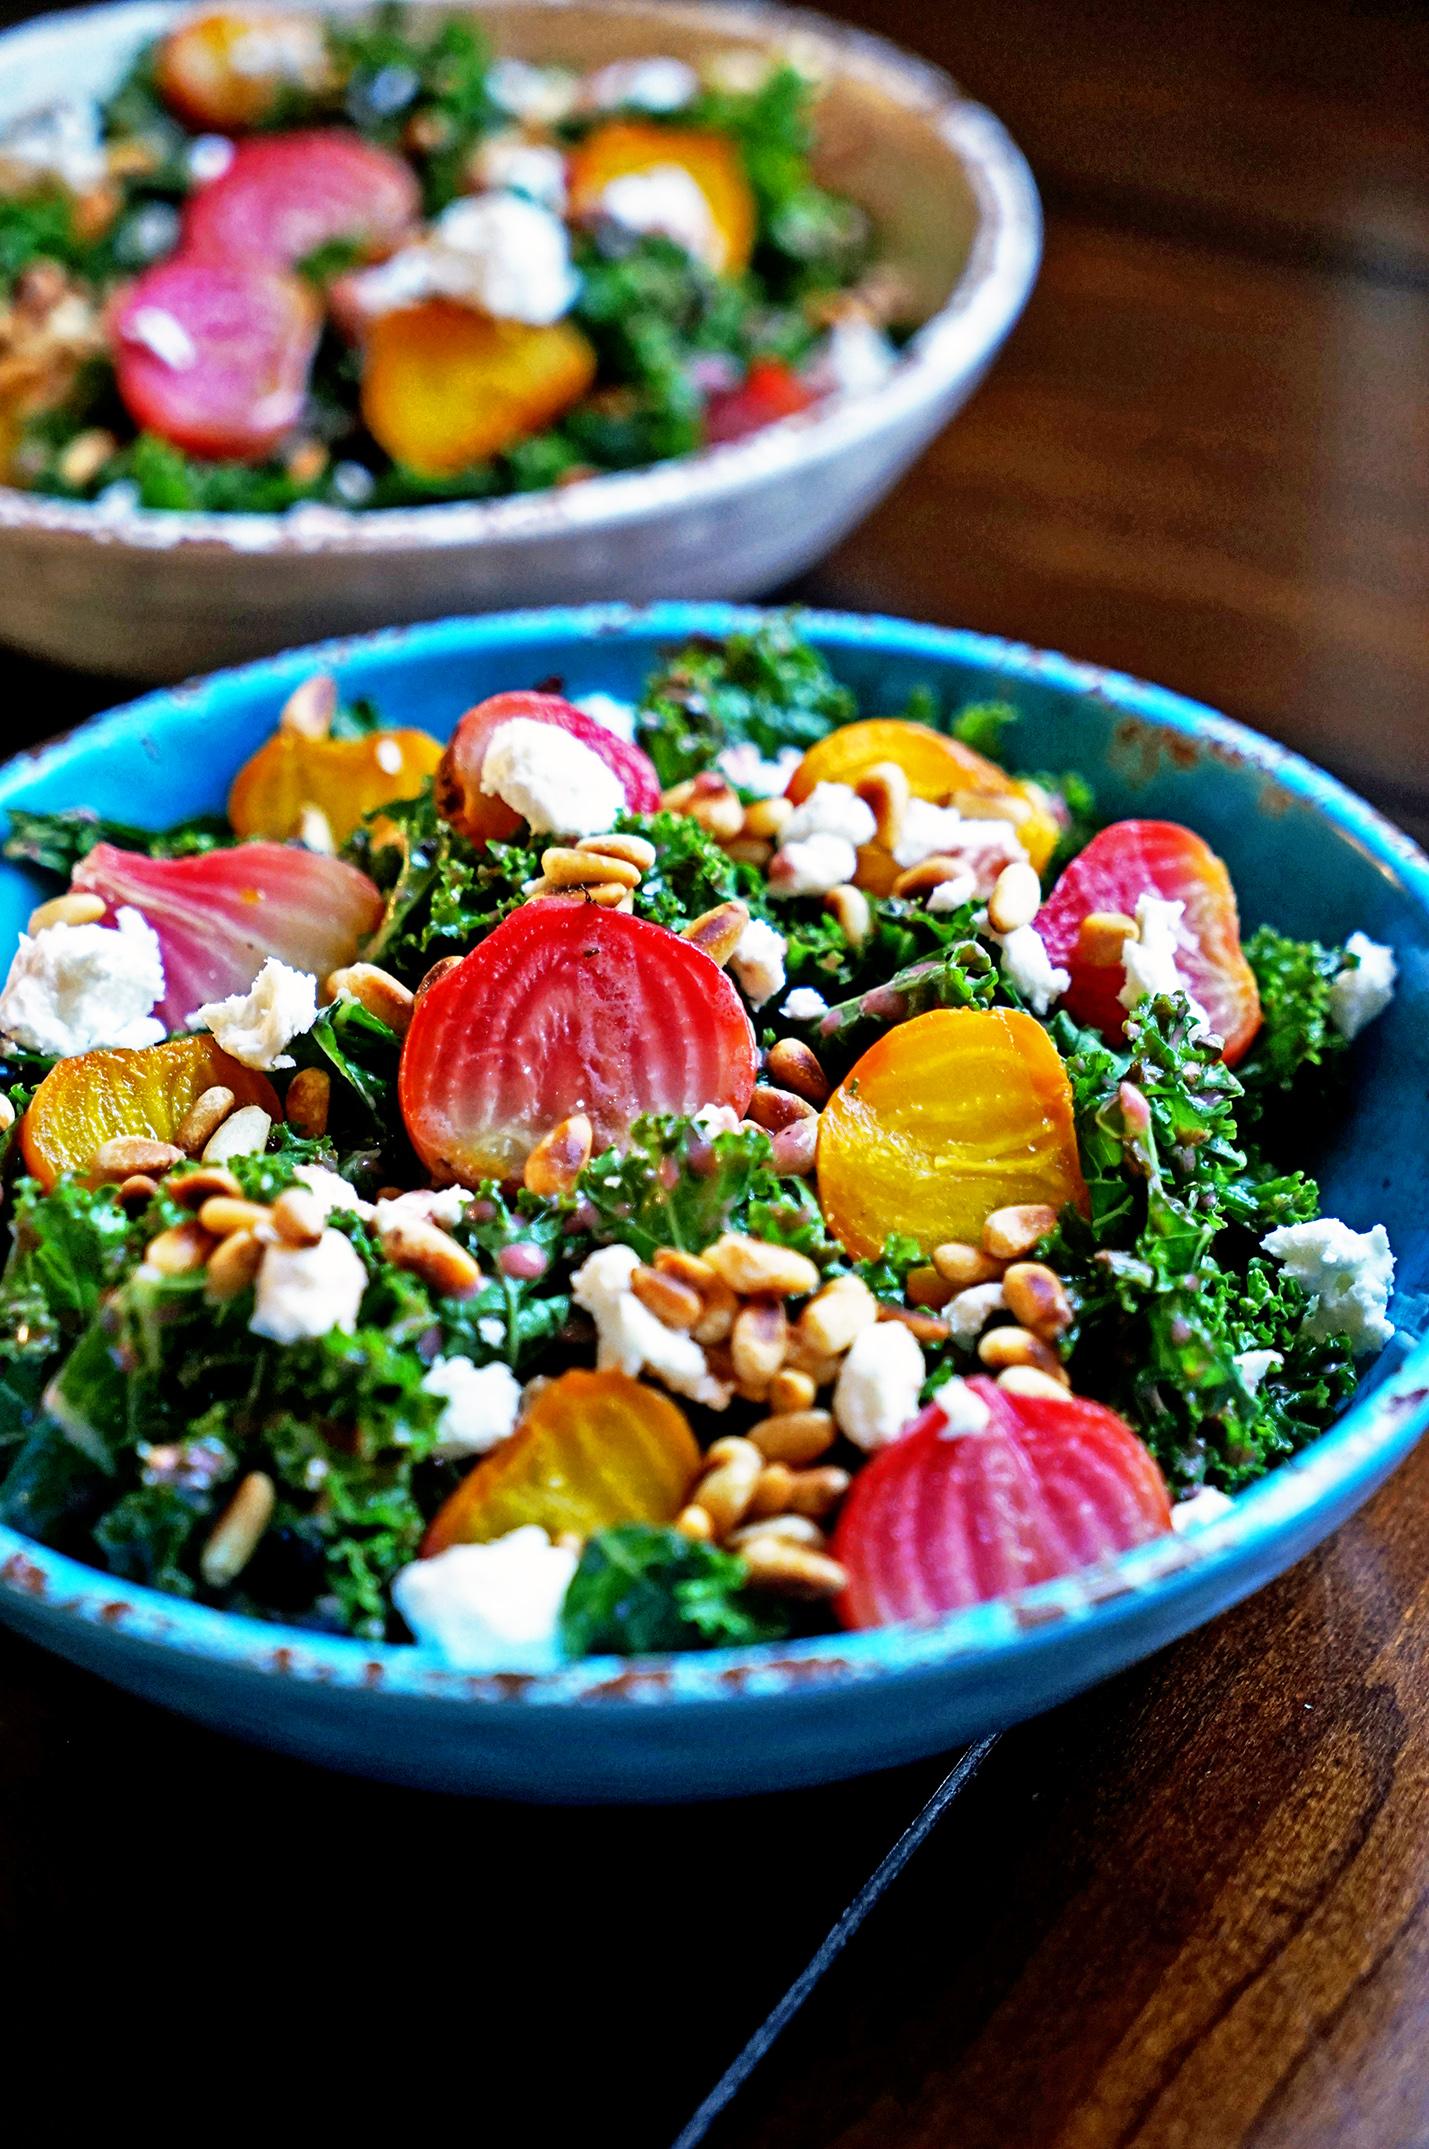 Roasted Beet Salad with Pomegranate Mint Vinaigrette